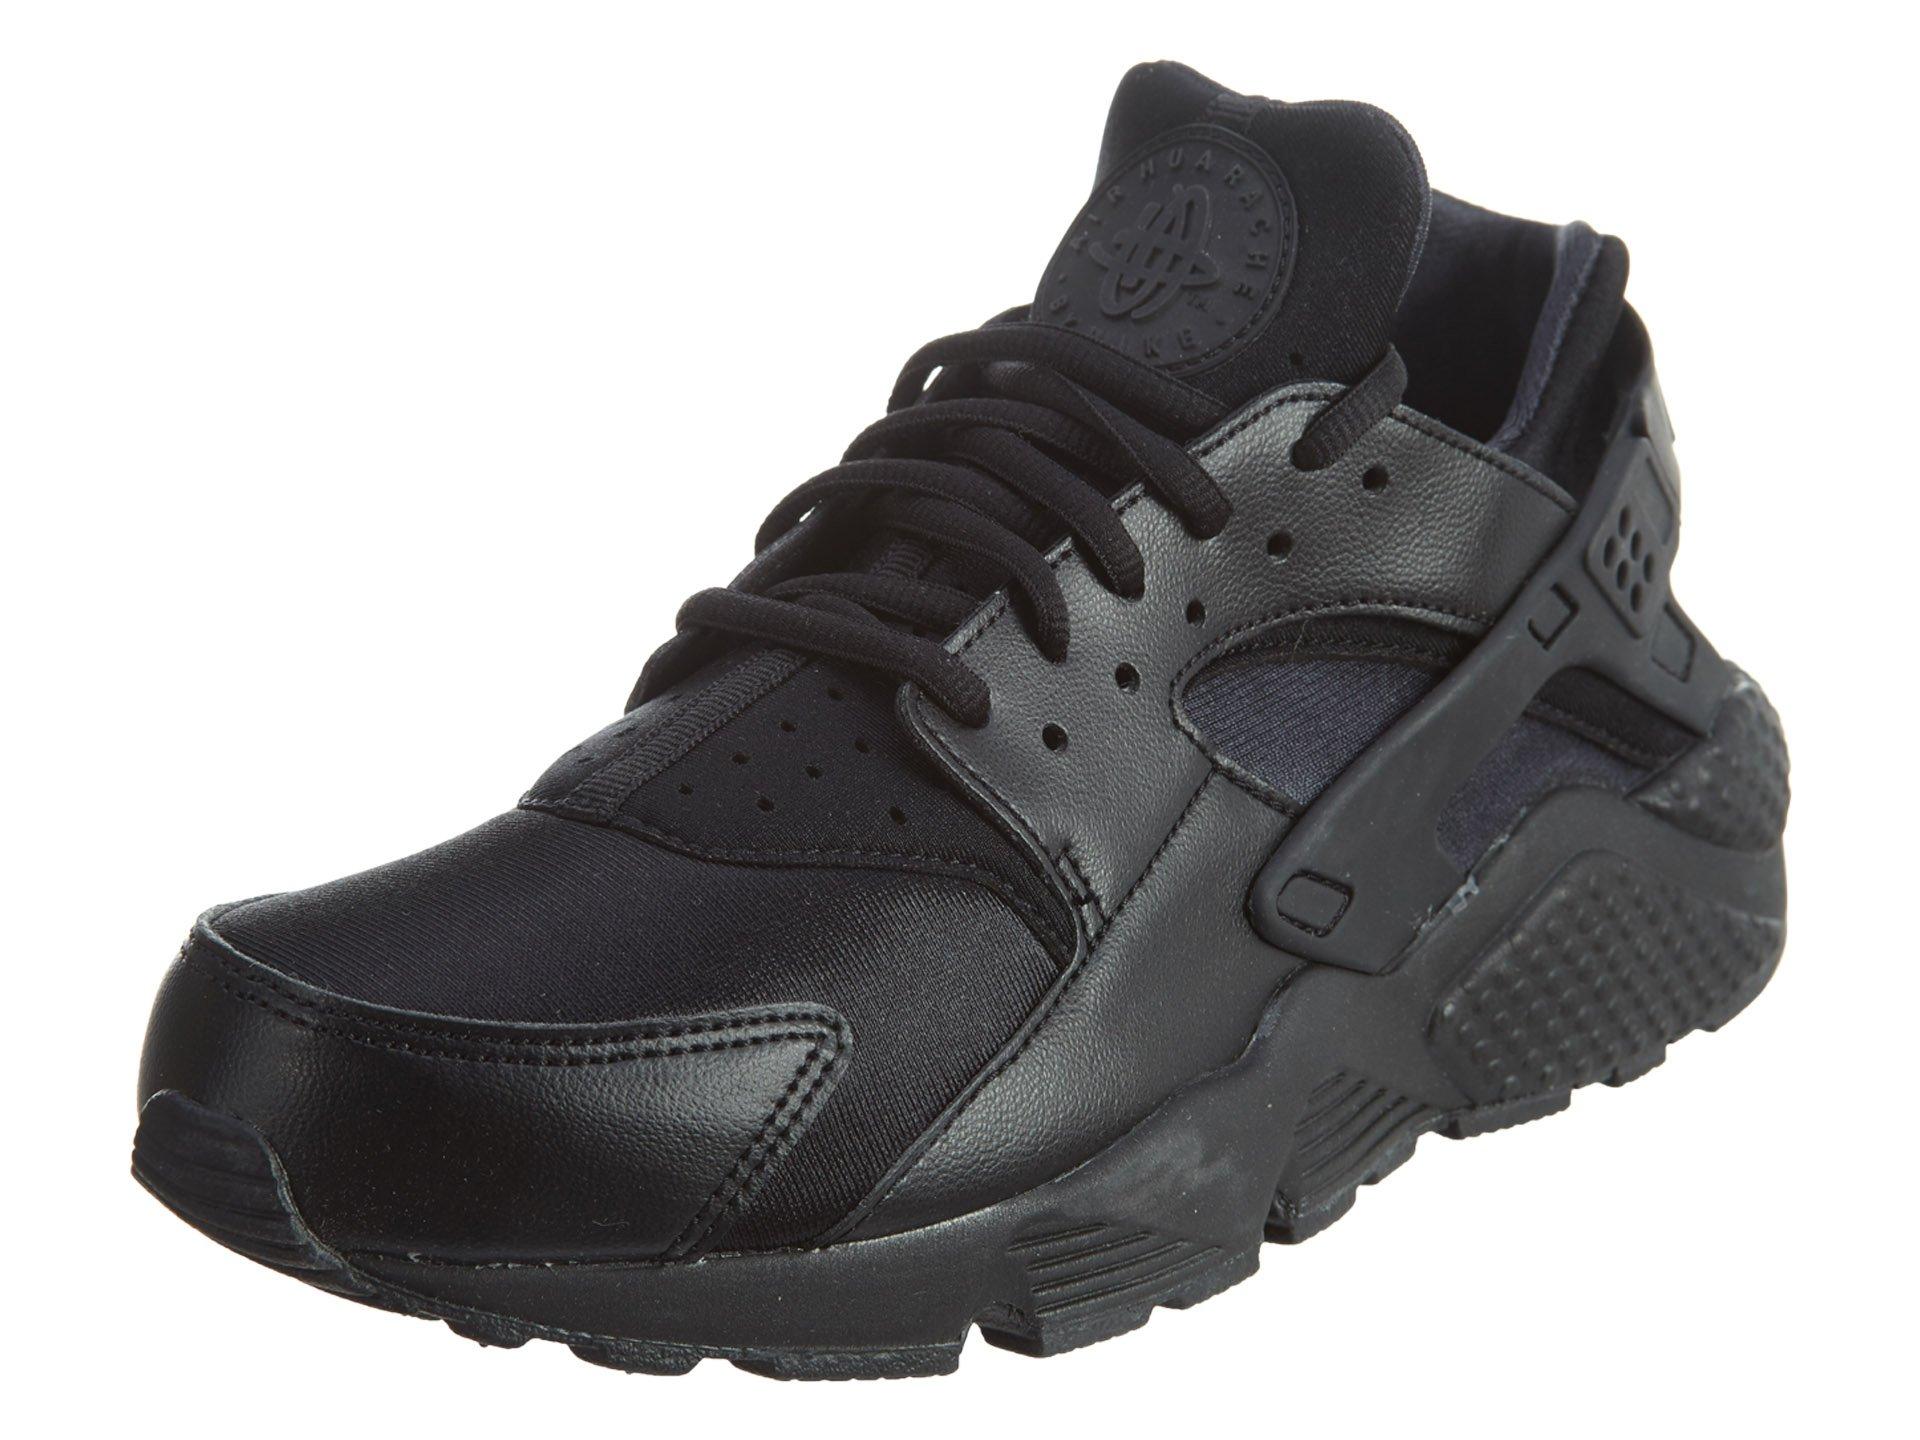 size 40 861ec c338d Galleon - Nike Women s Air Huarache Run Running Shoe 10 Black